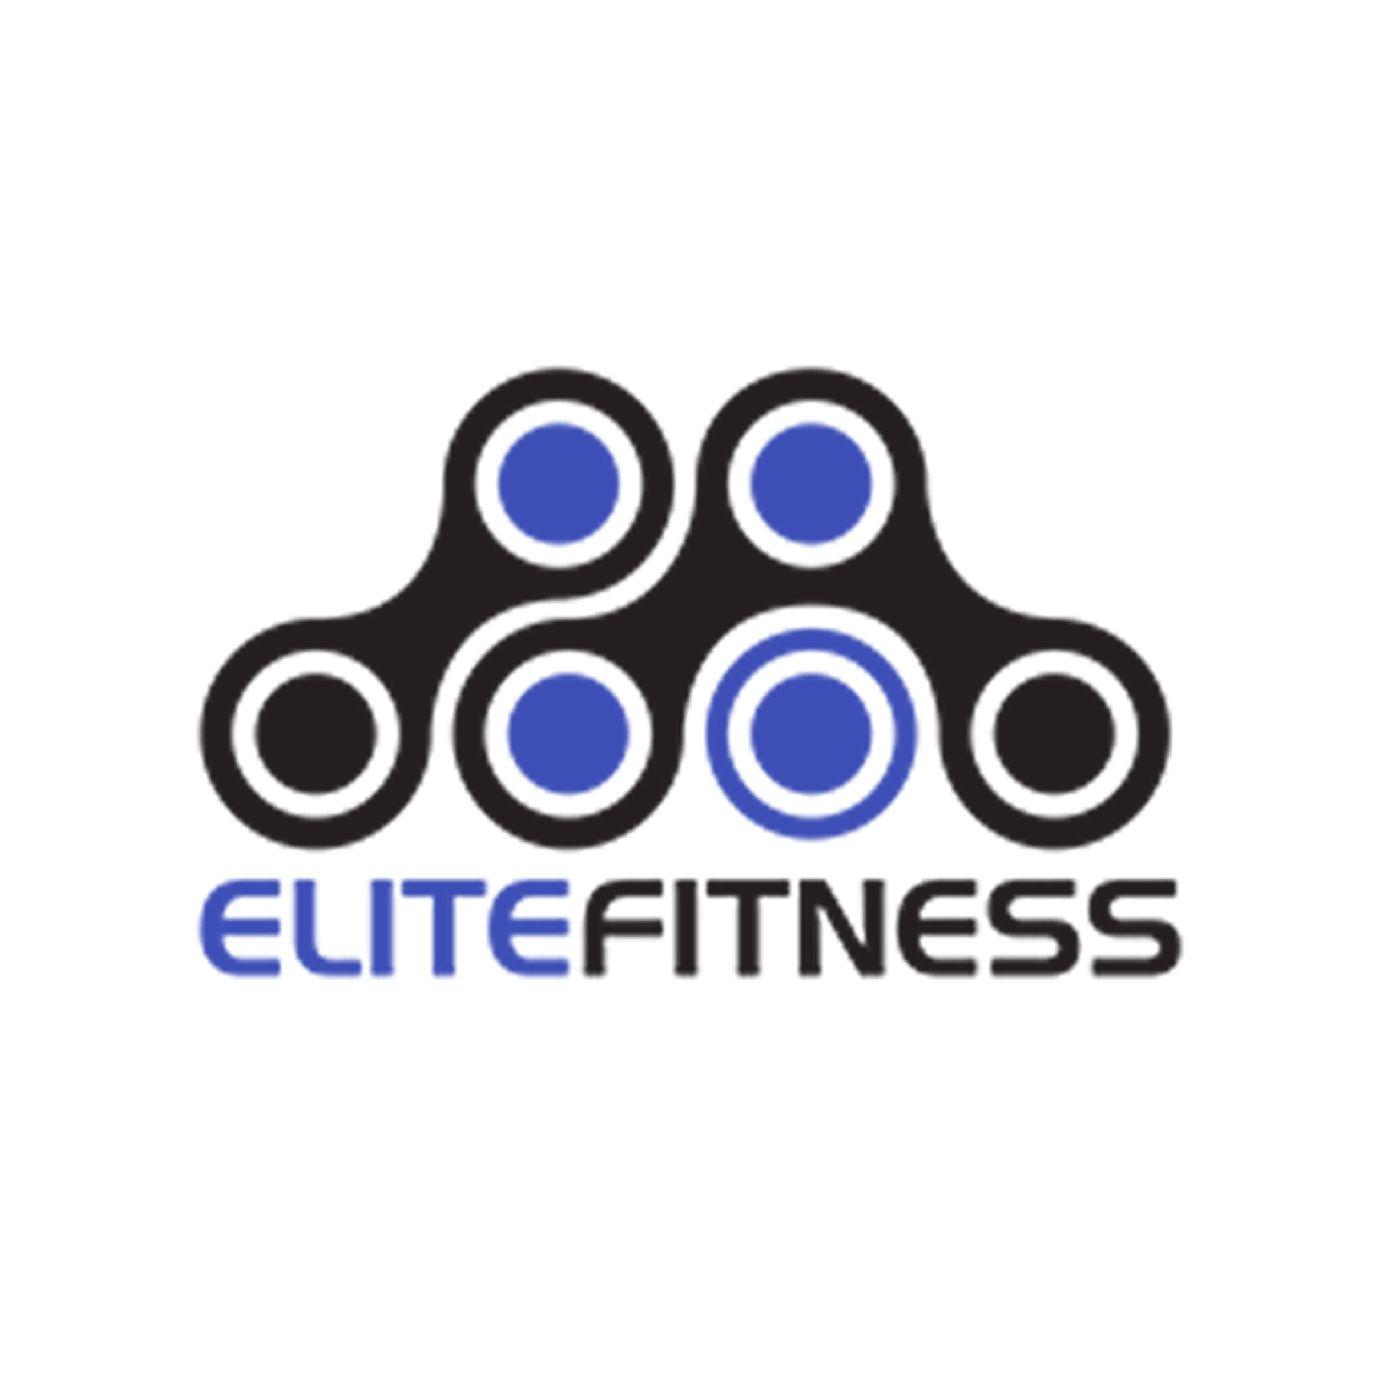 Elitefitness Podcast